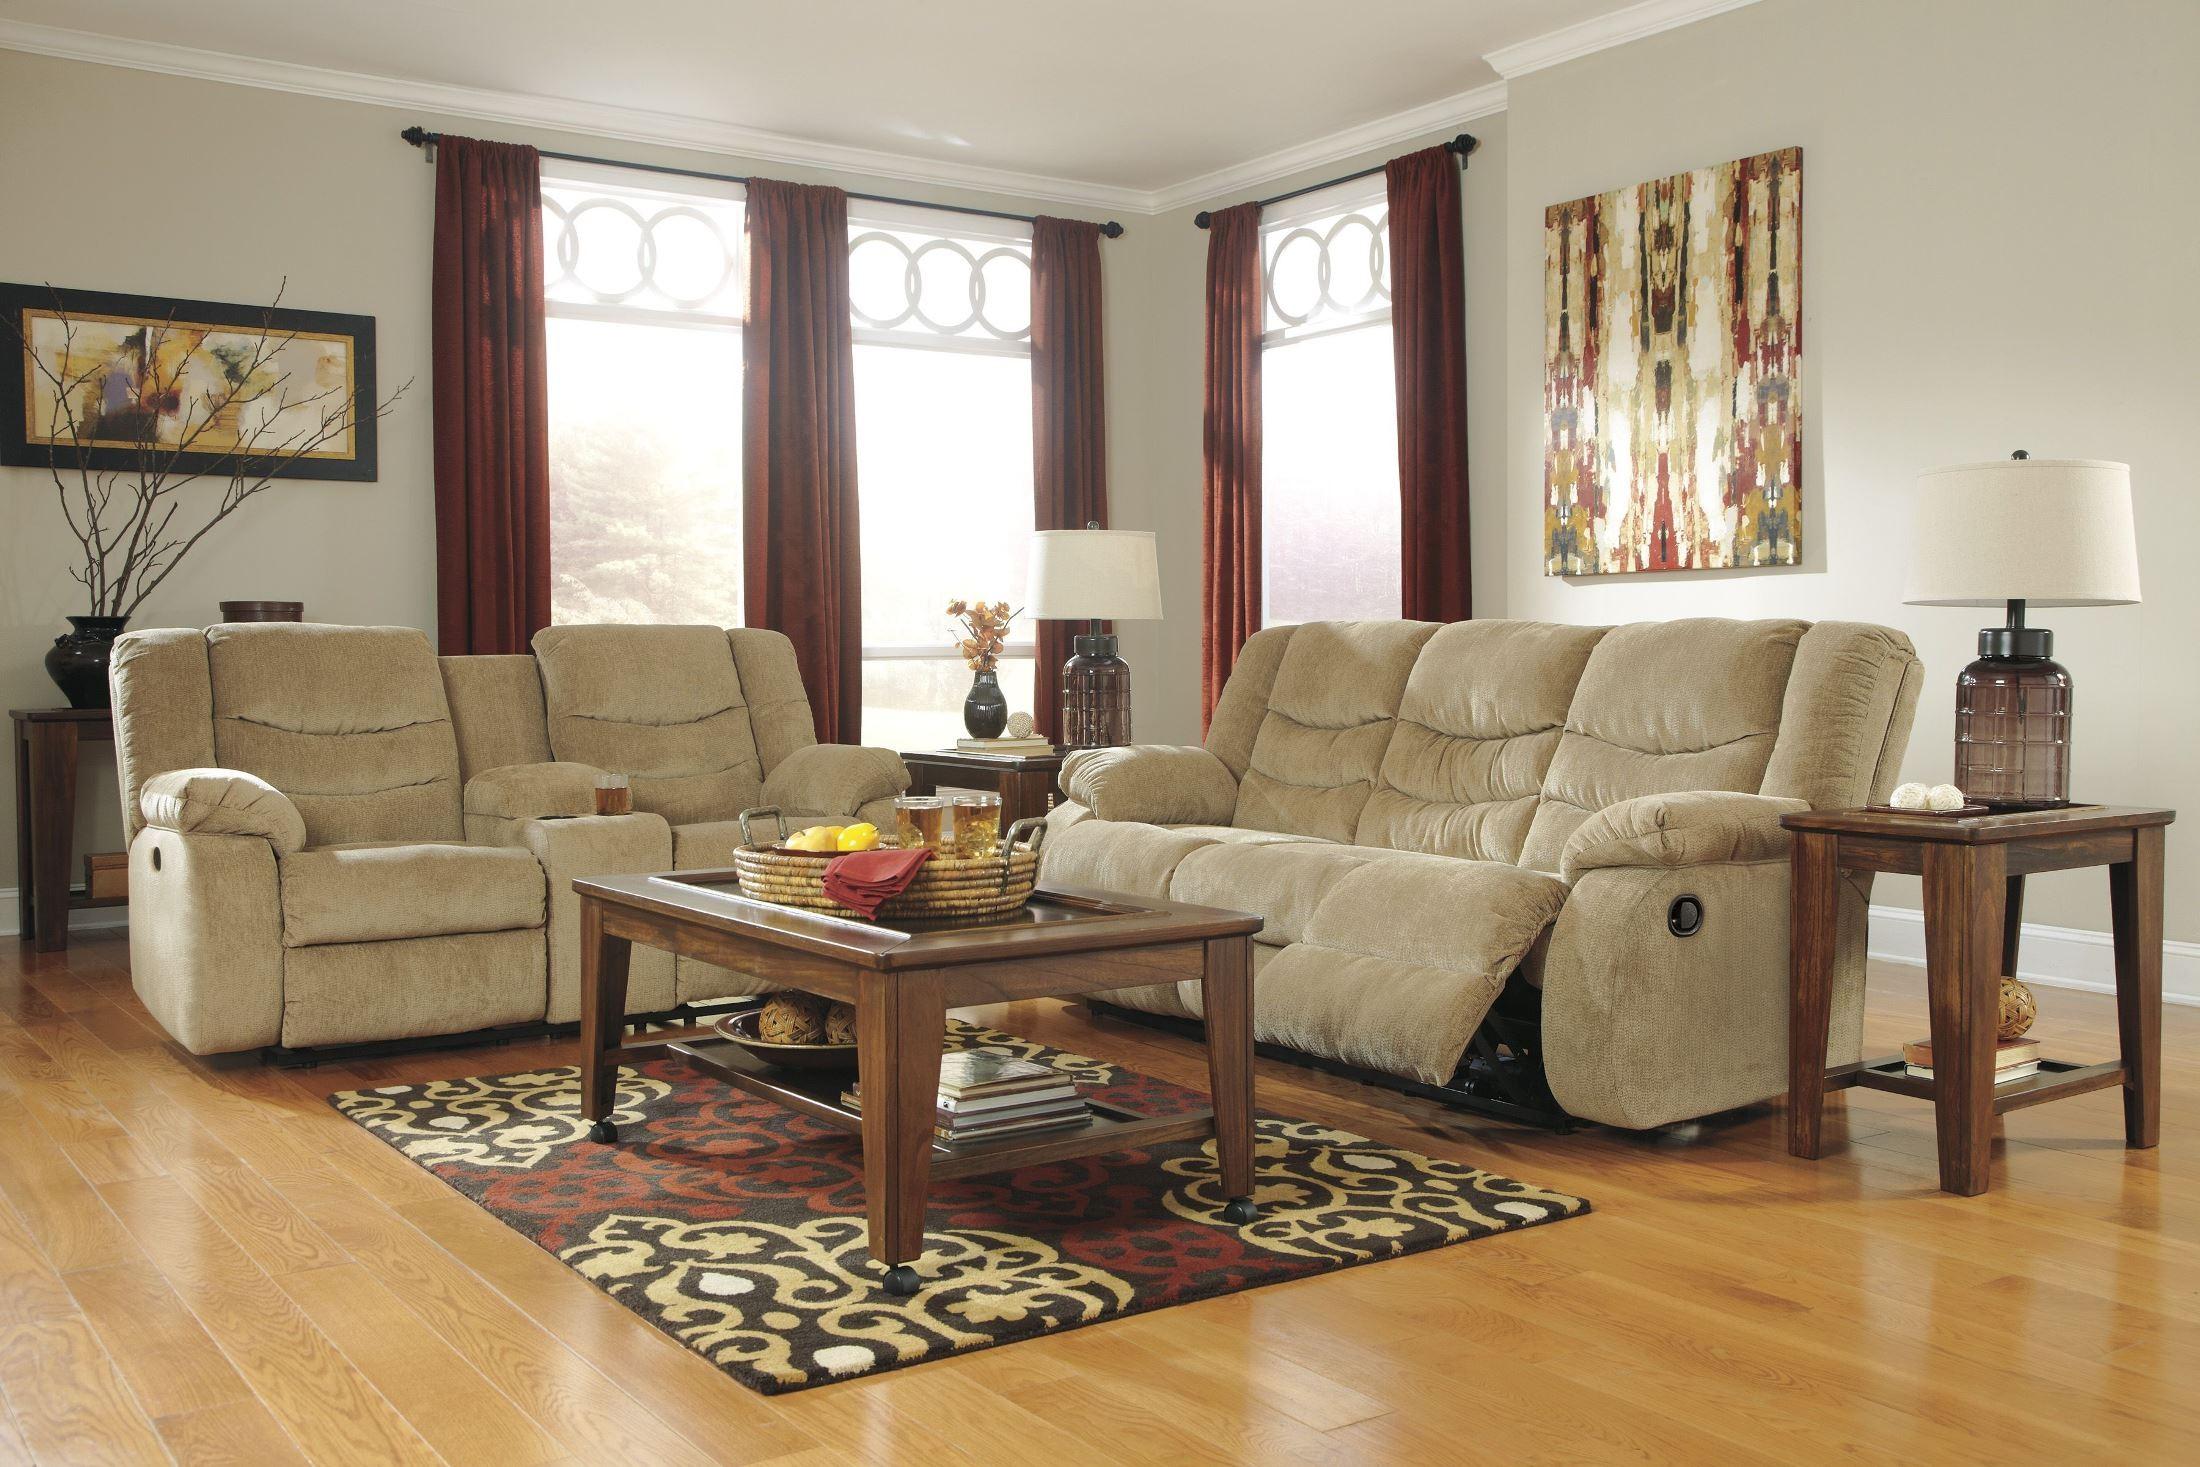 Garek sand reclining living room set from ashley 92002 88 for Living room 94